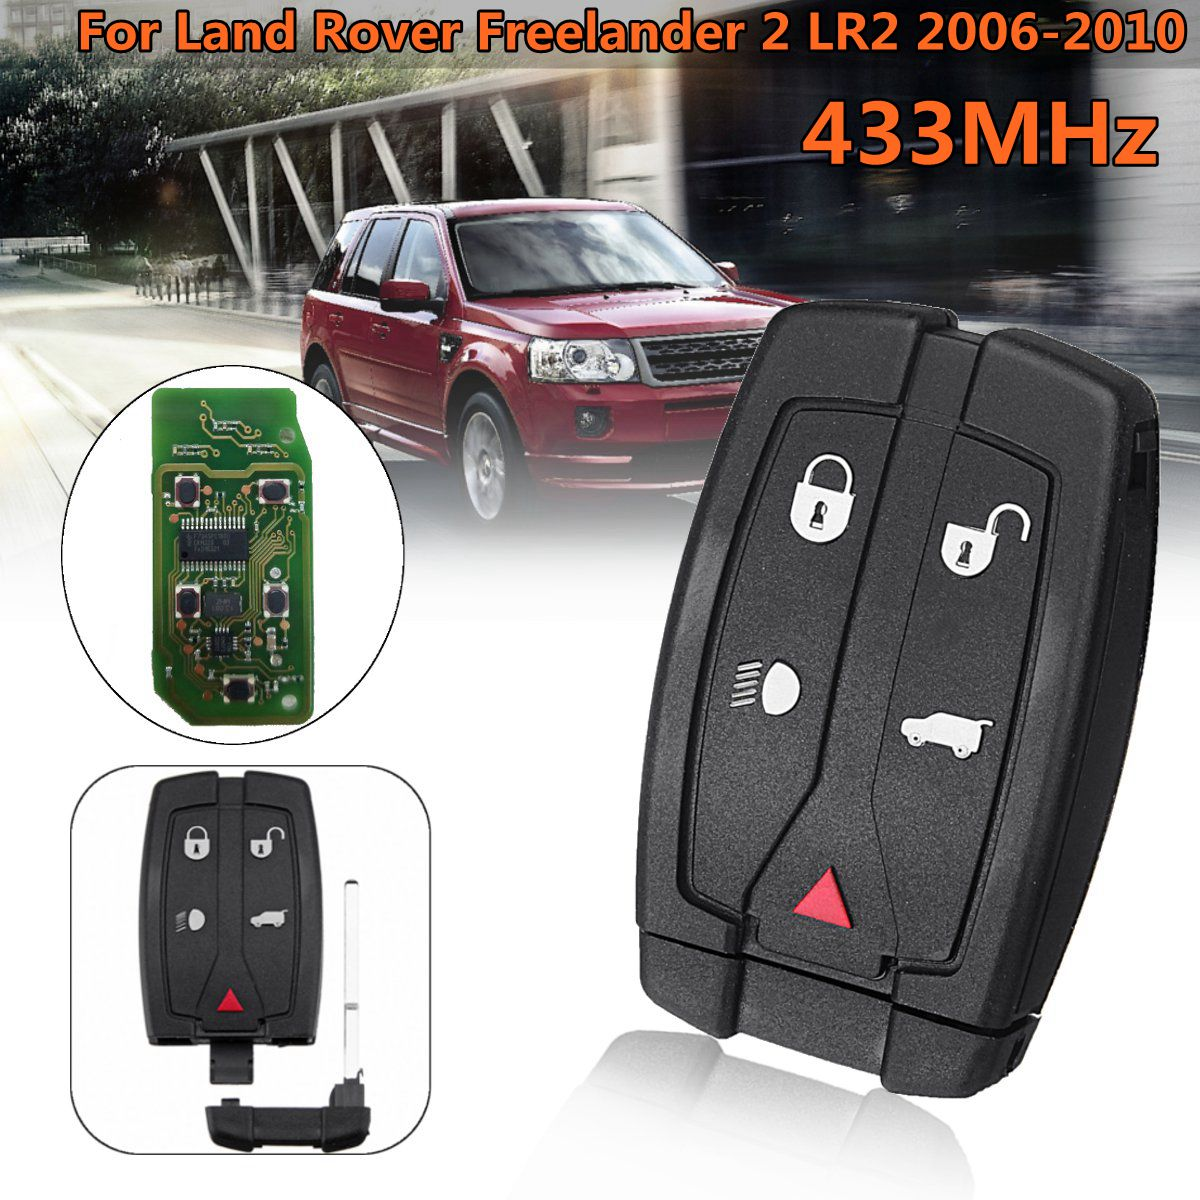 Car Key Fob Keyless Entry Smart Remote fits 2008-2012 Land Rover LR2 USARemote NT8-TX9, 3043A-TX9